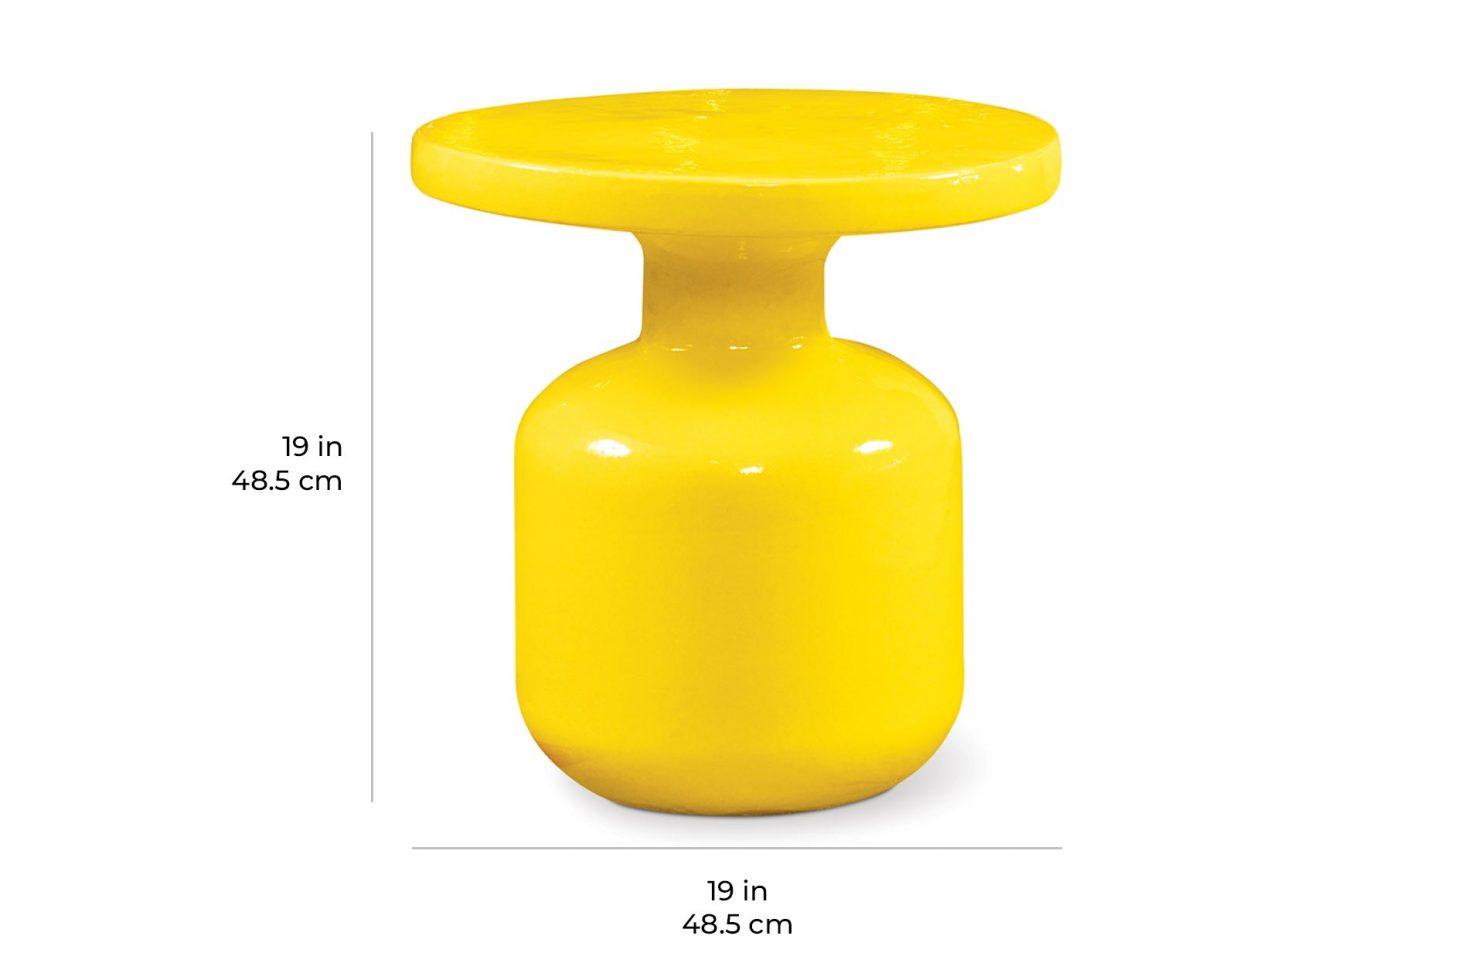 cer bottle 308FT355P2 scale dims